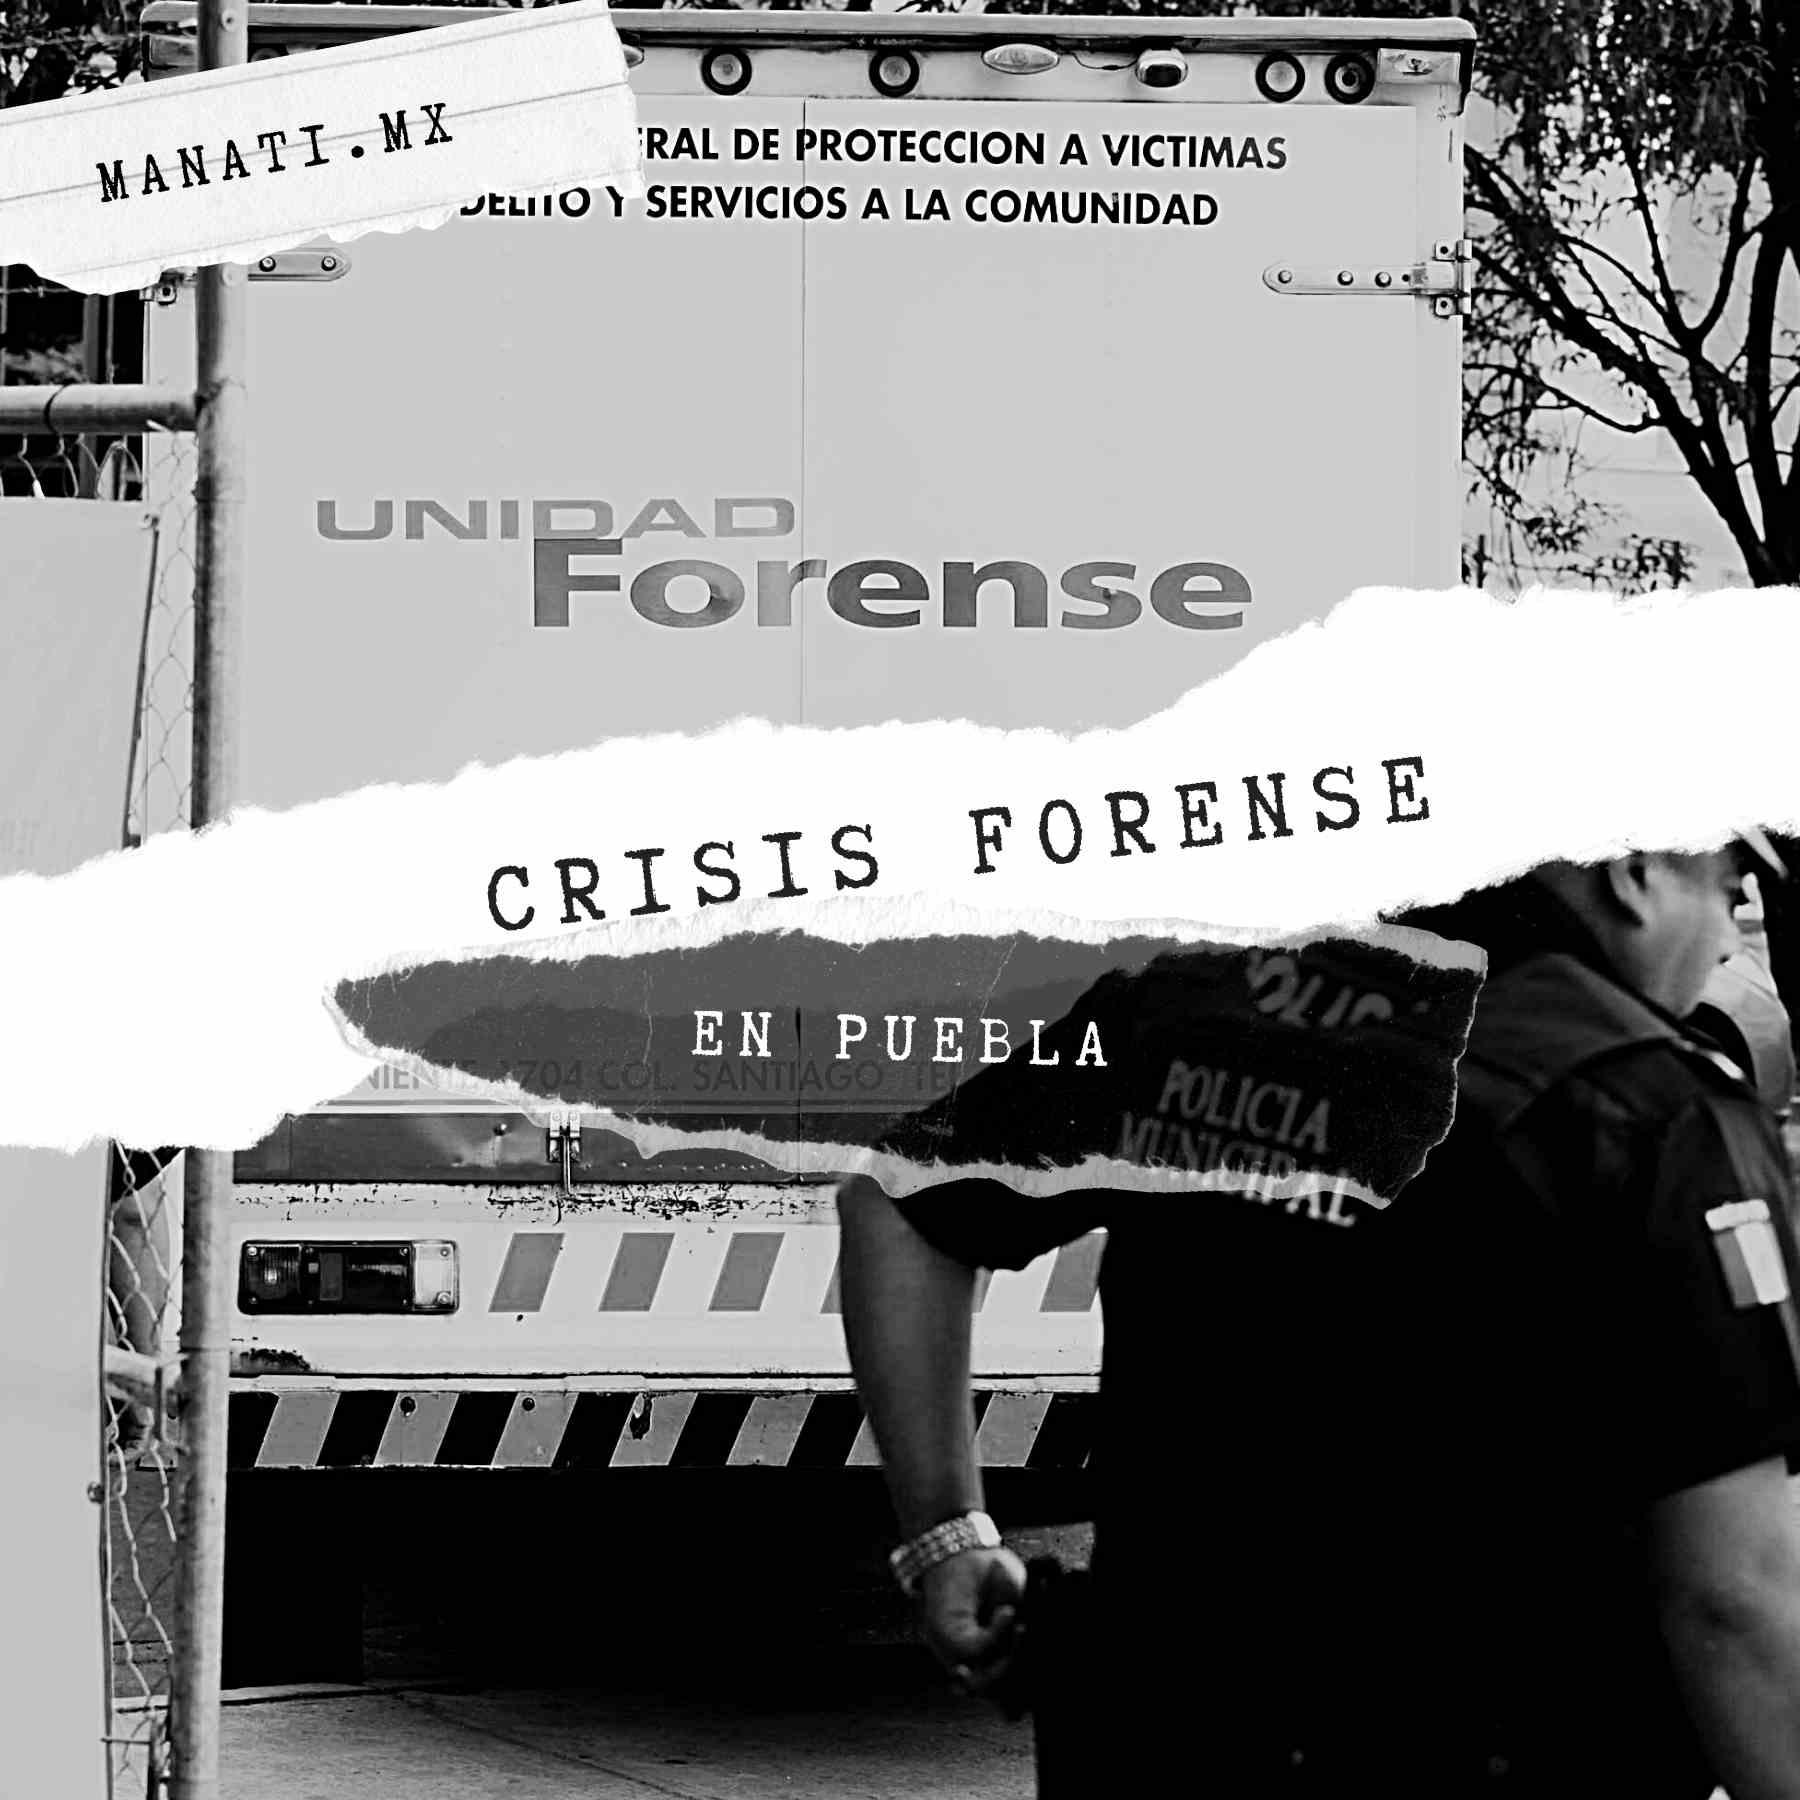 fosa clandestina puebla semefo crisis forense